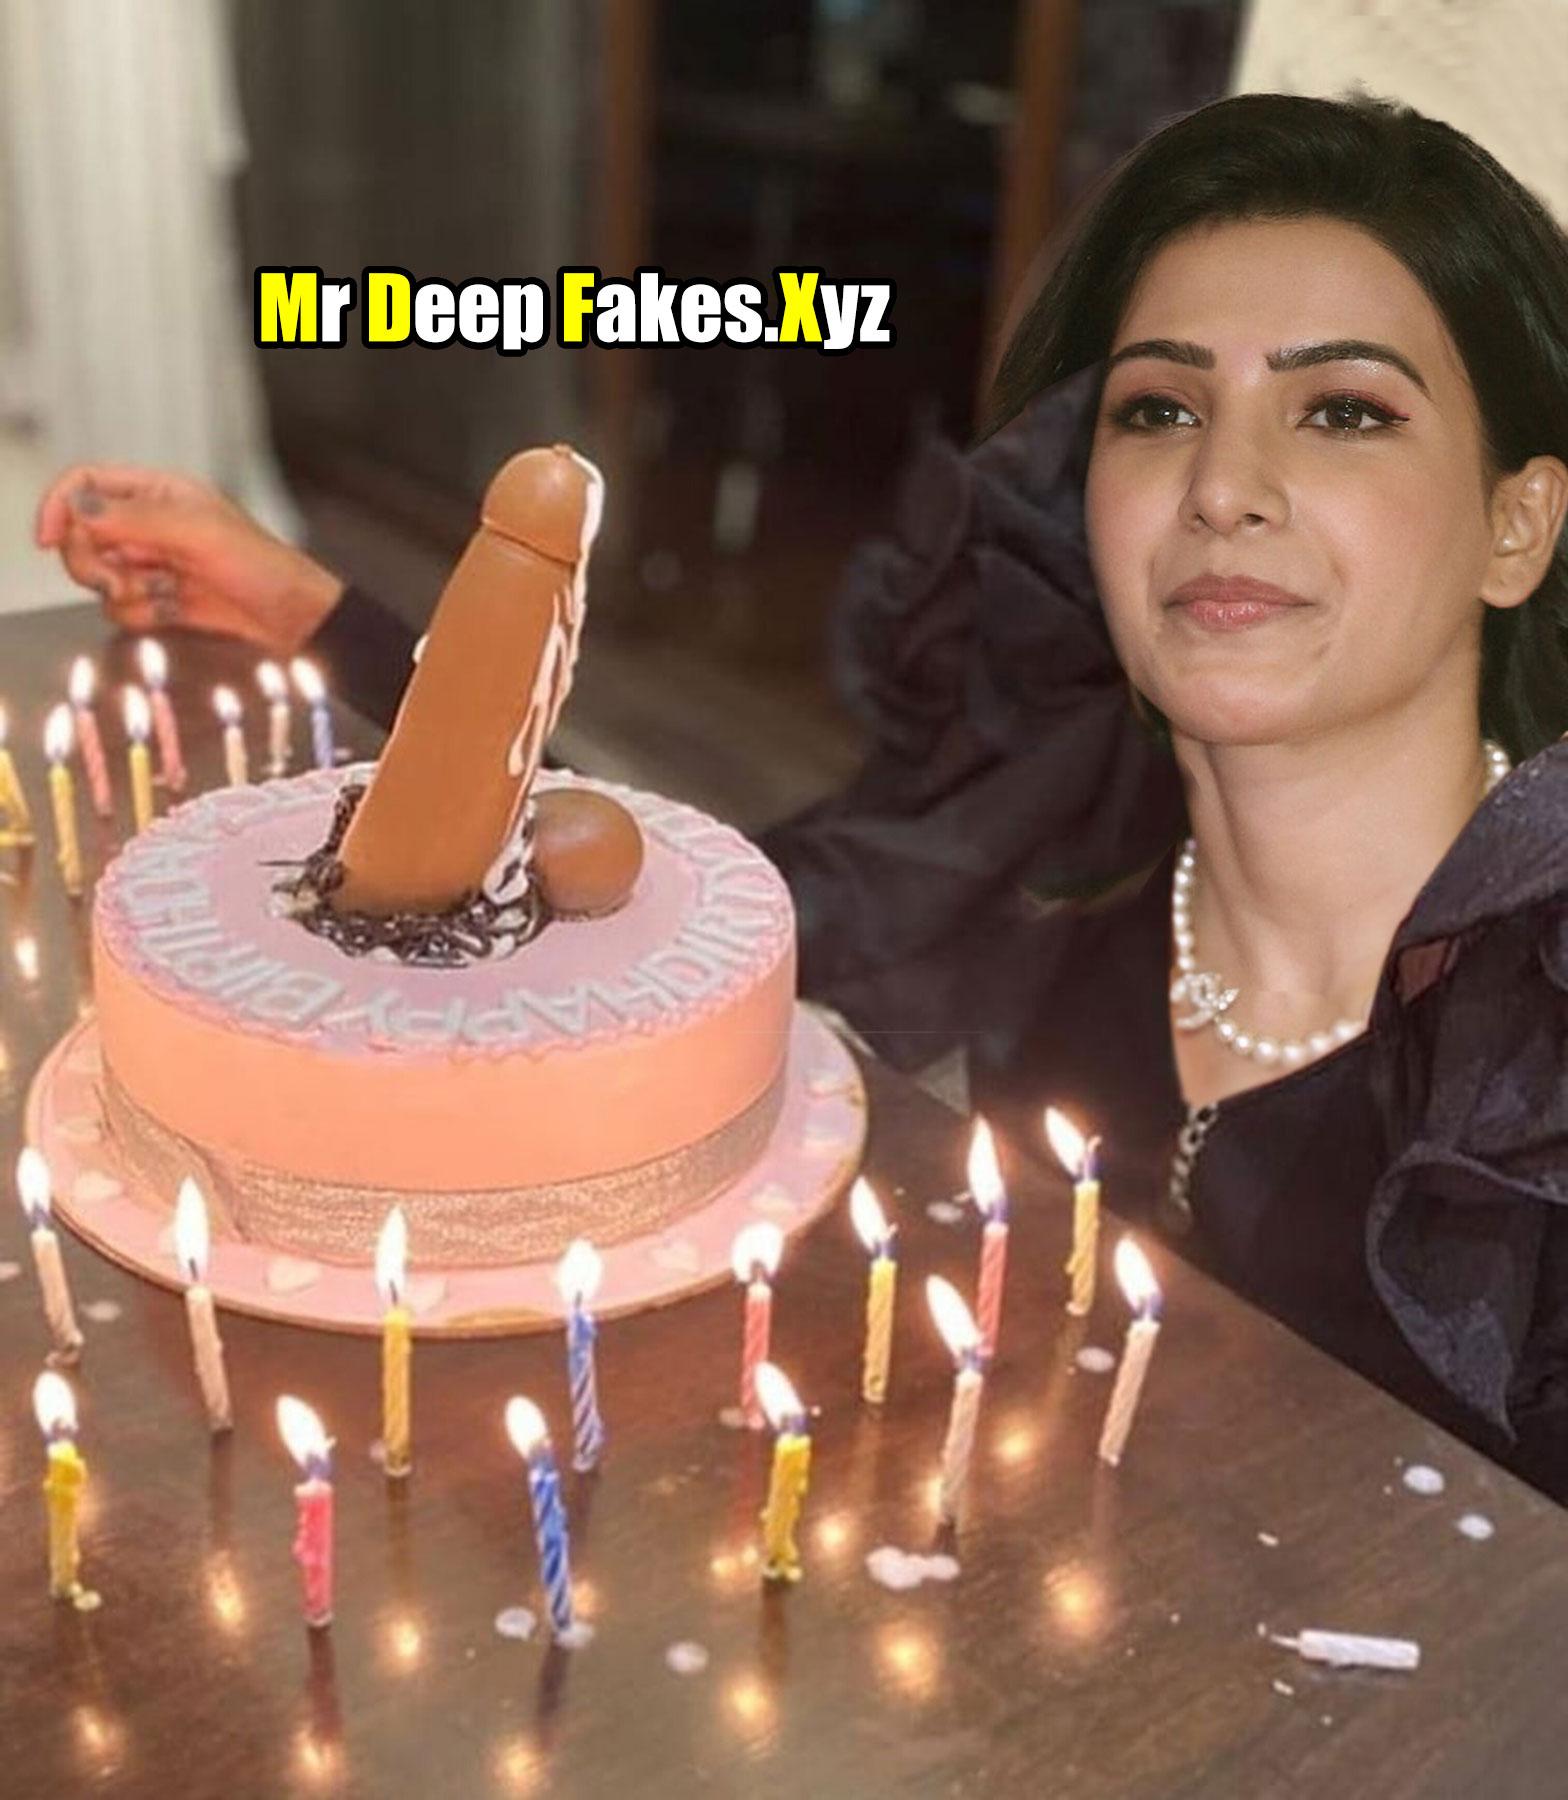 Samantha Akkineni cock birthday cake xxx bitch actress leaked photo